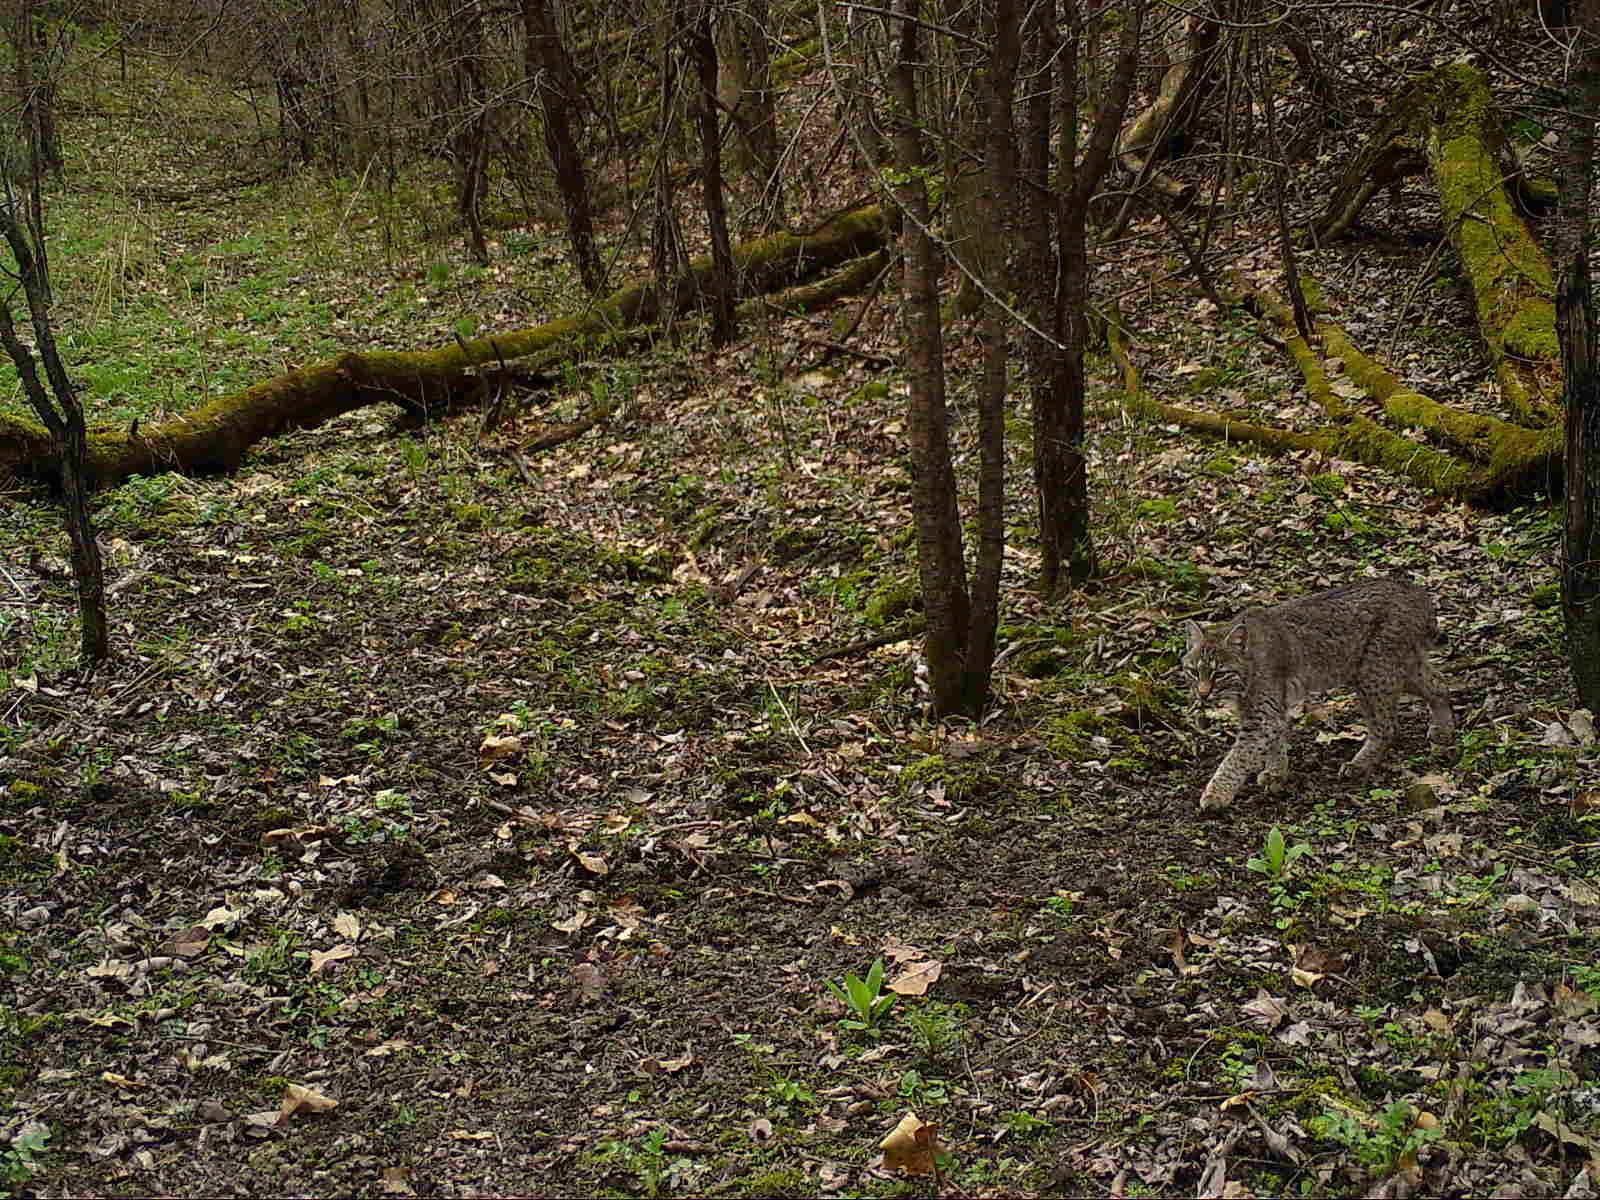 A bobcat walking through the woods